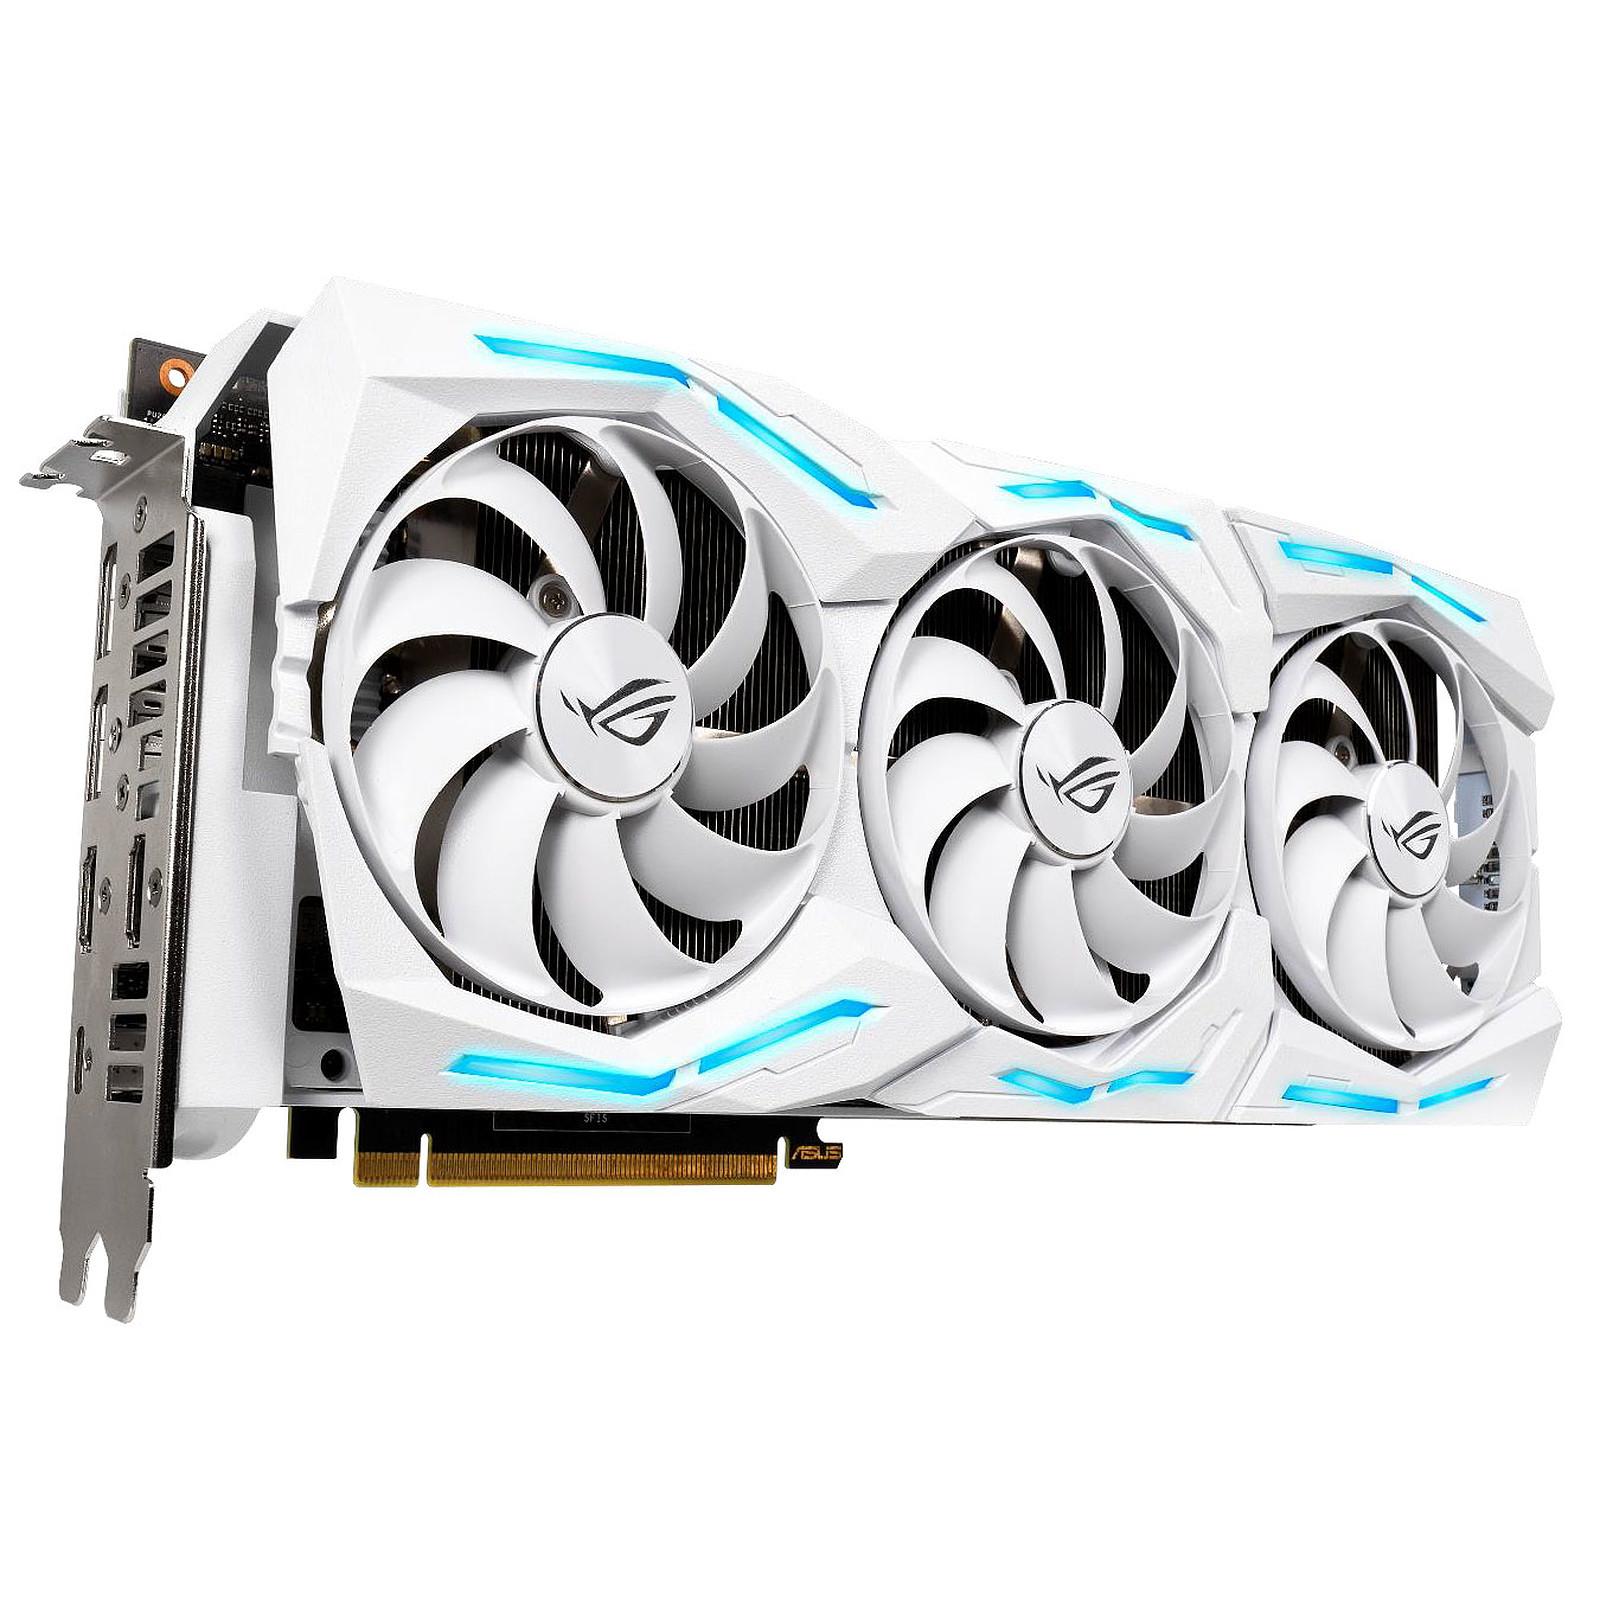 ASUS GeForce RTX 2080 Ti ROG-STRIX-RTX2080TI-O11G-WHITE-GAMING - Edition Spéciale